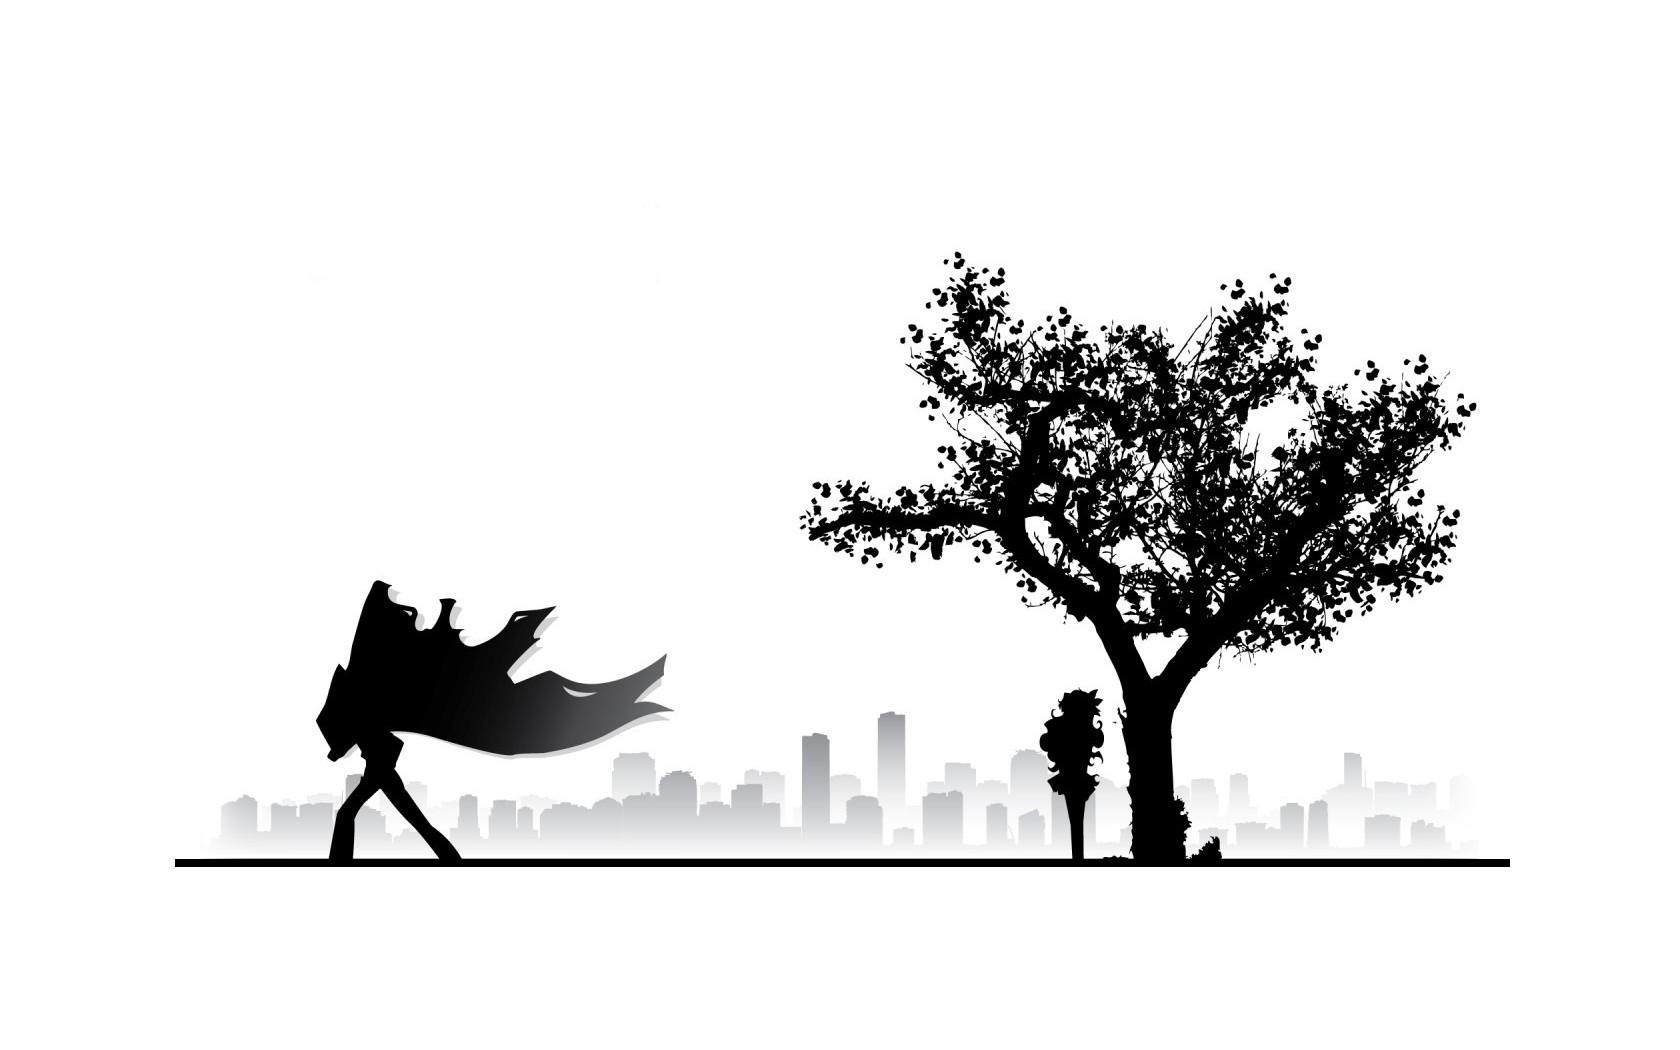 Tapety Ilustrace Silueta Logo Vetev Kreslena Pohadka Tengen